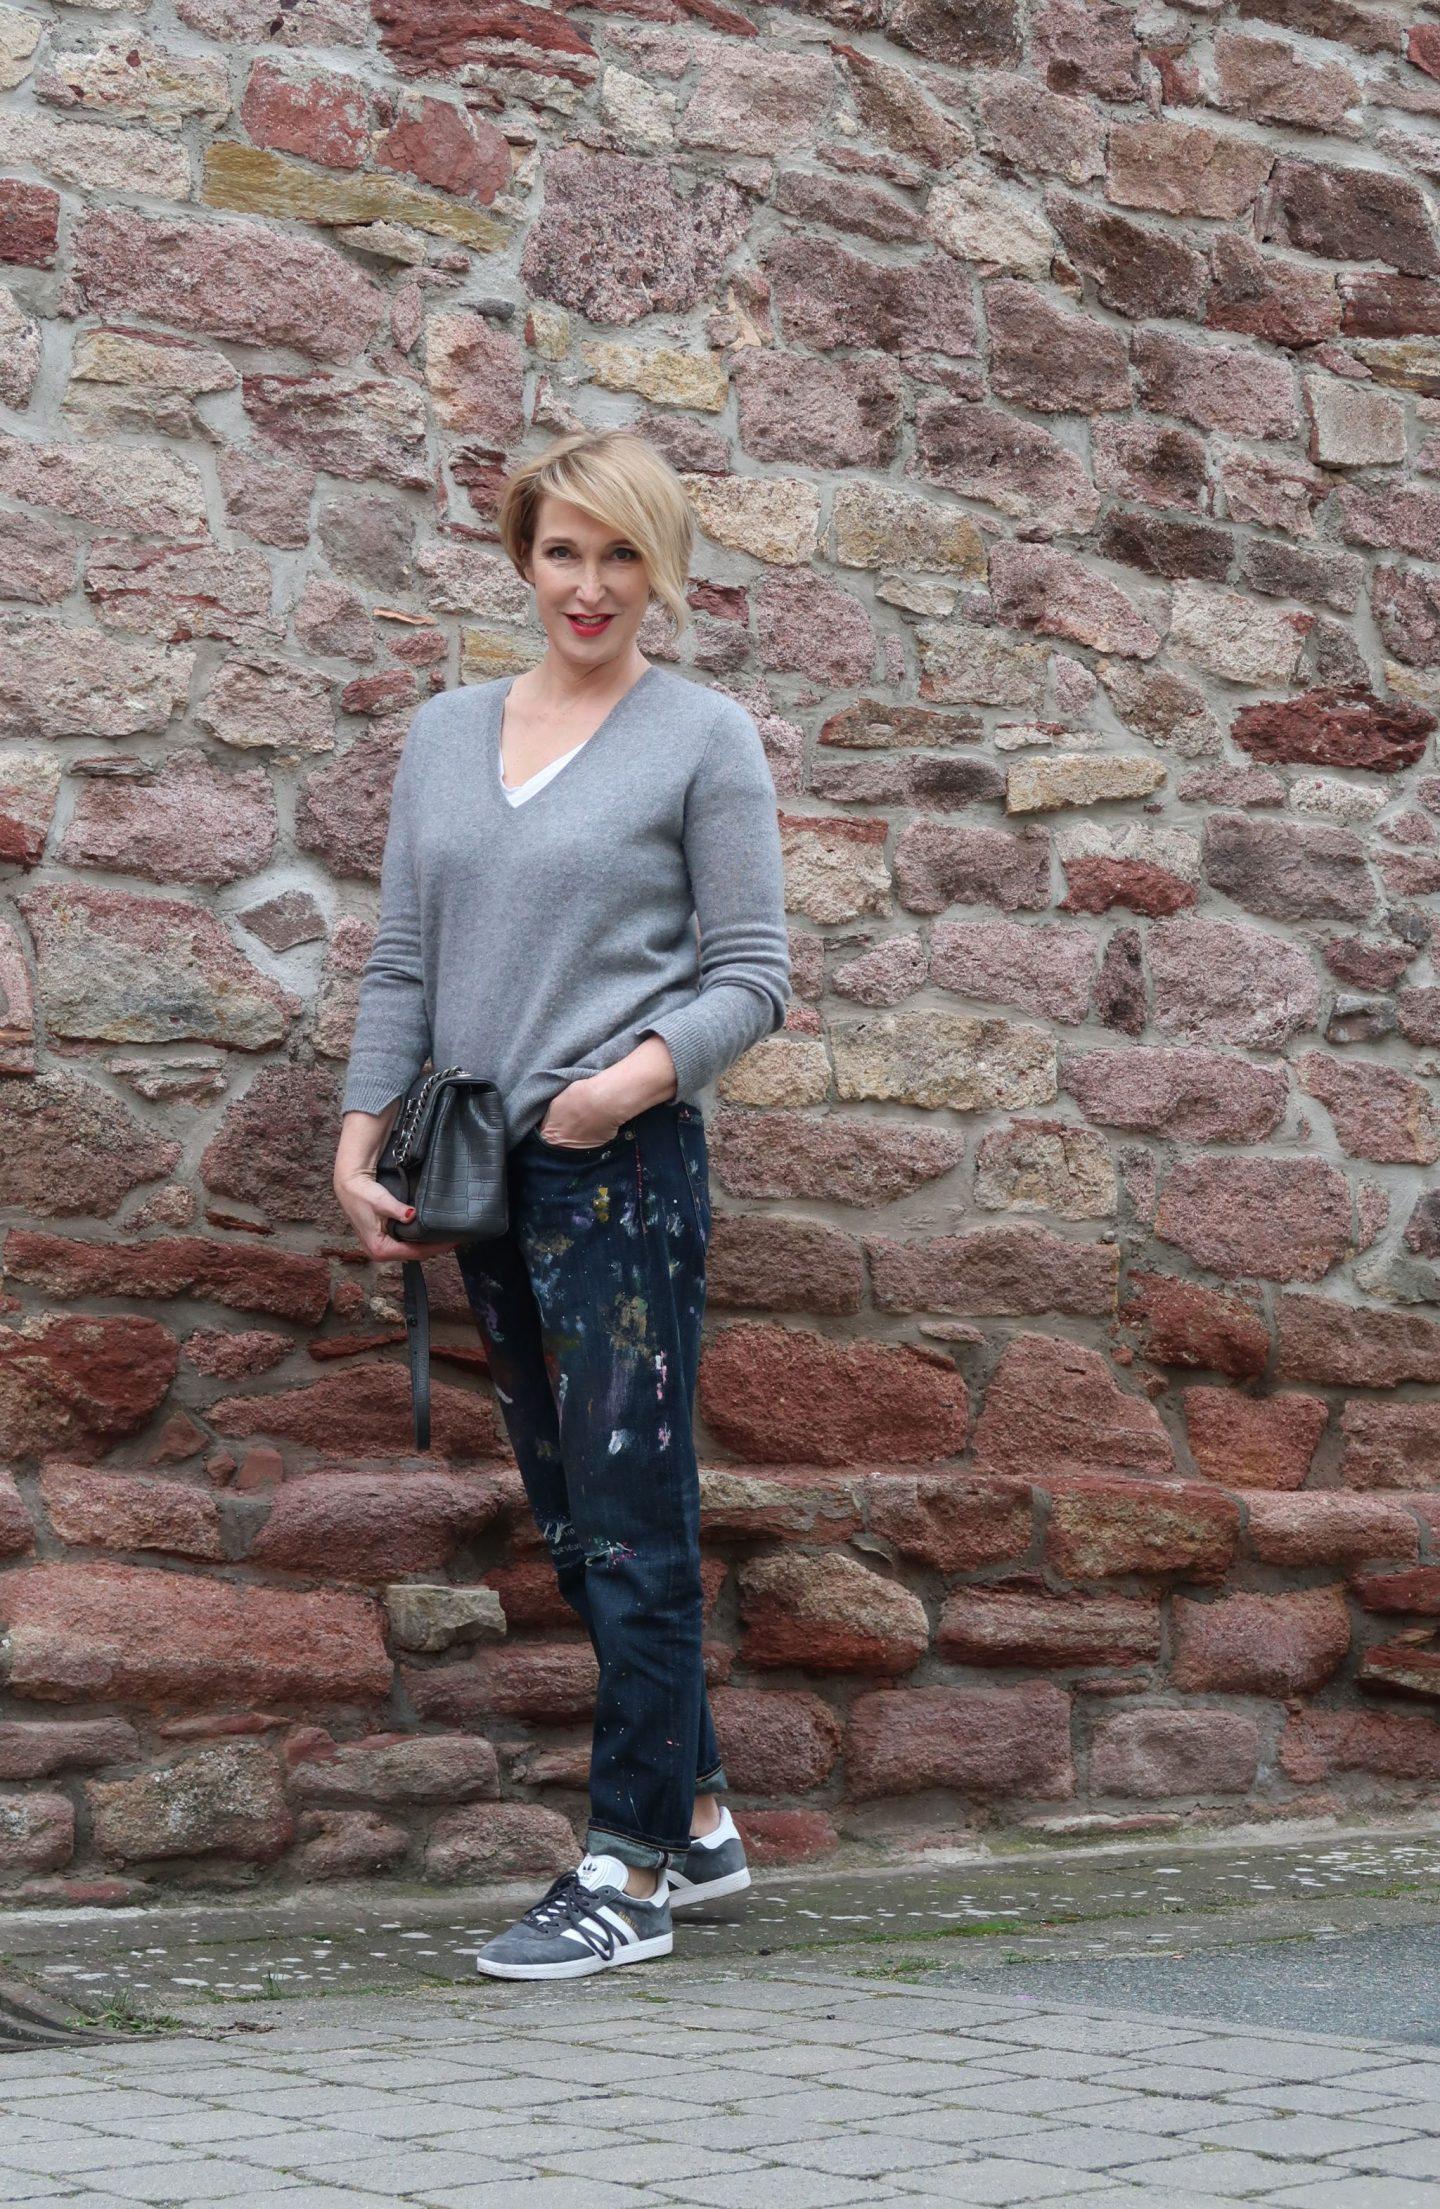 glamupyourlifestyle uebergangsjacken trenchcoat trenchjacke boyfriend-jeans ue40-mode ue40-blog